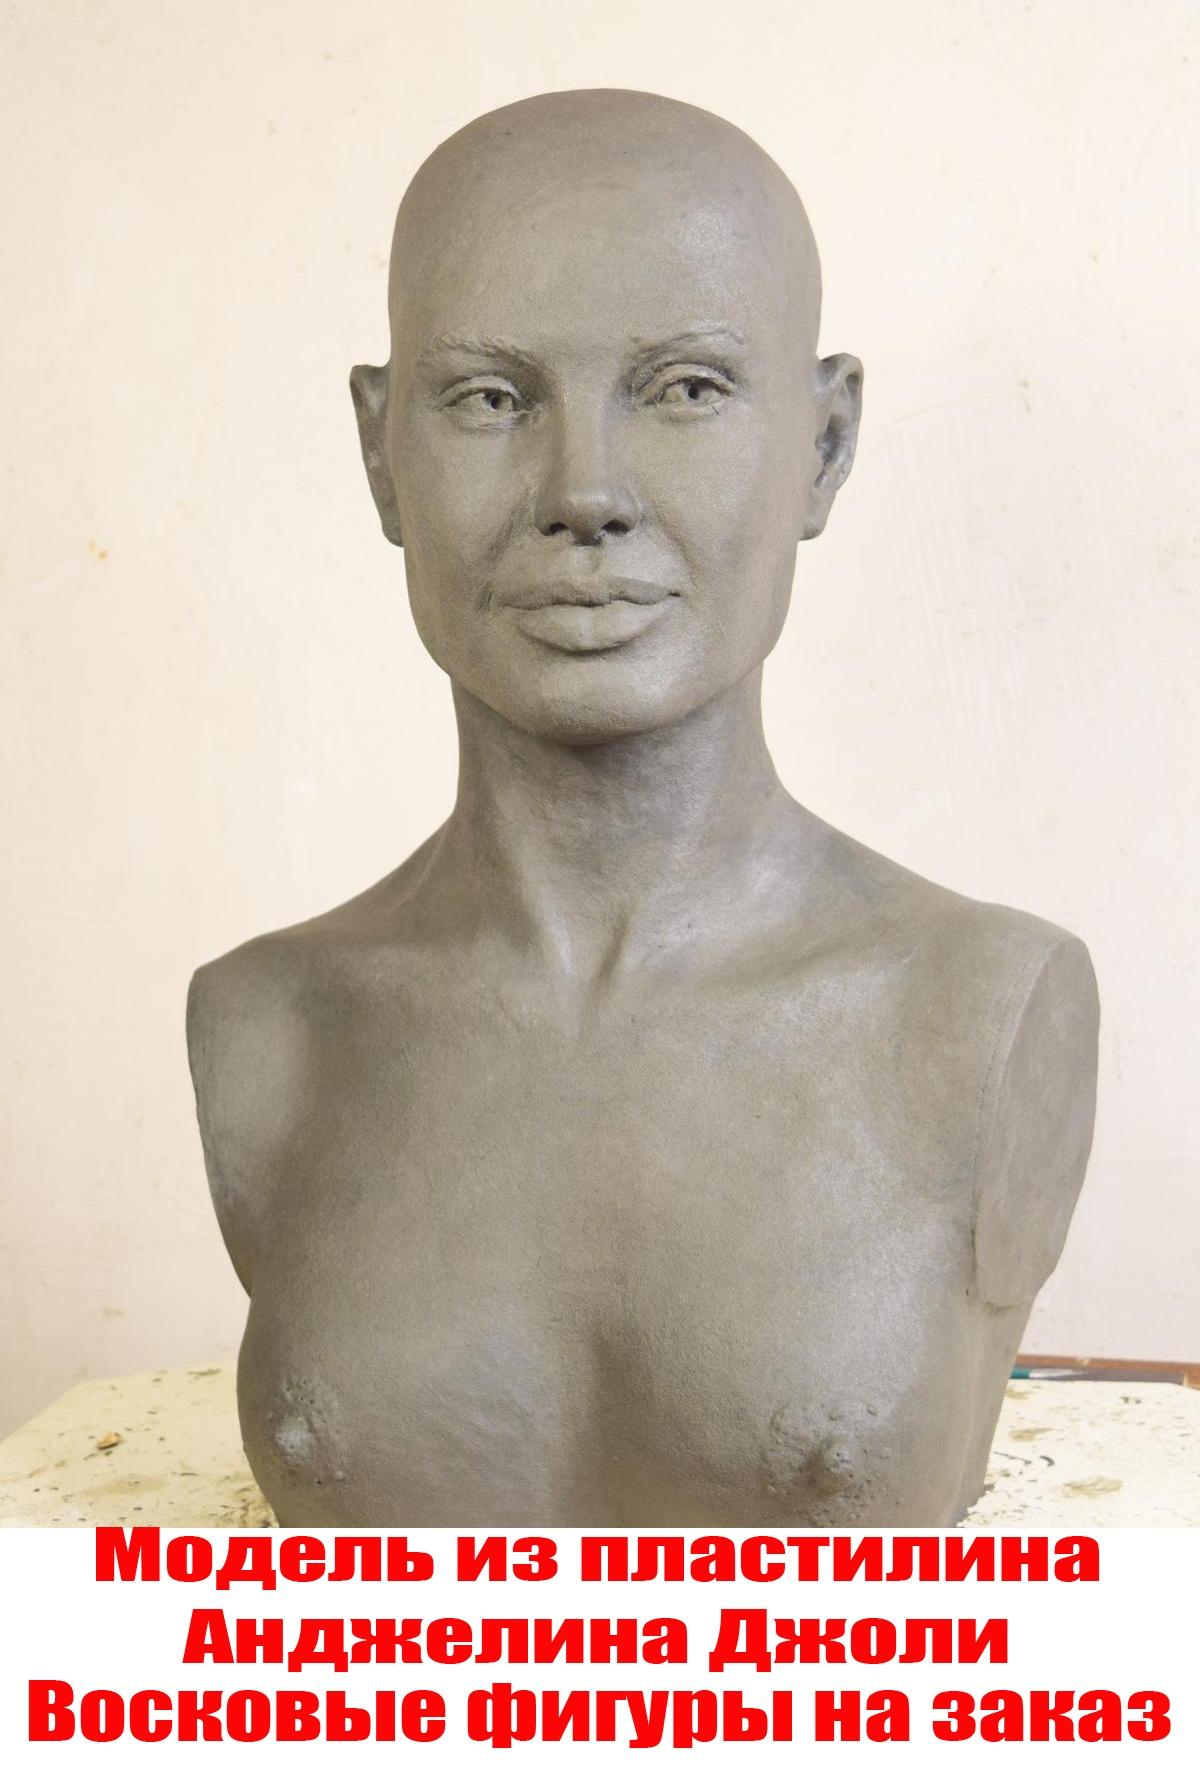 Лысая Анджелина Джоли